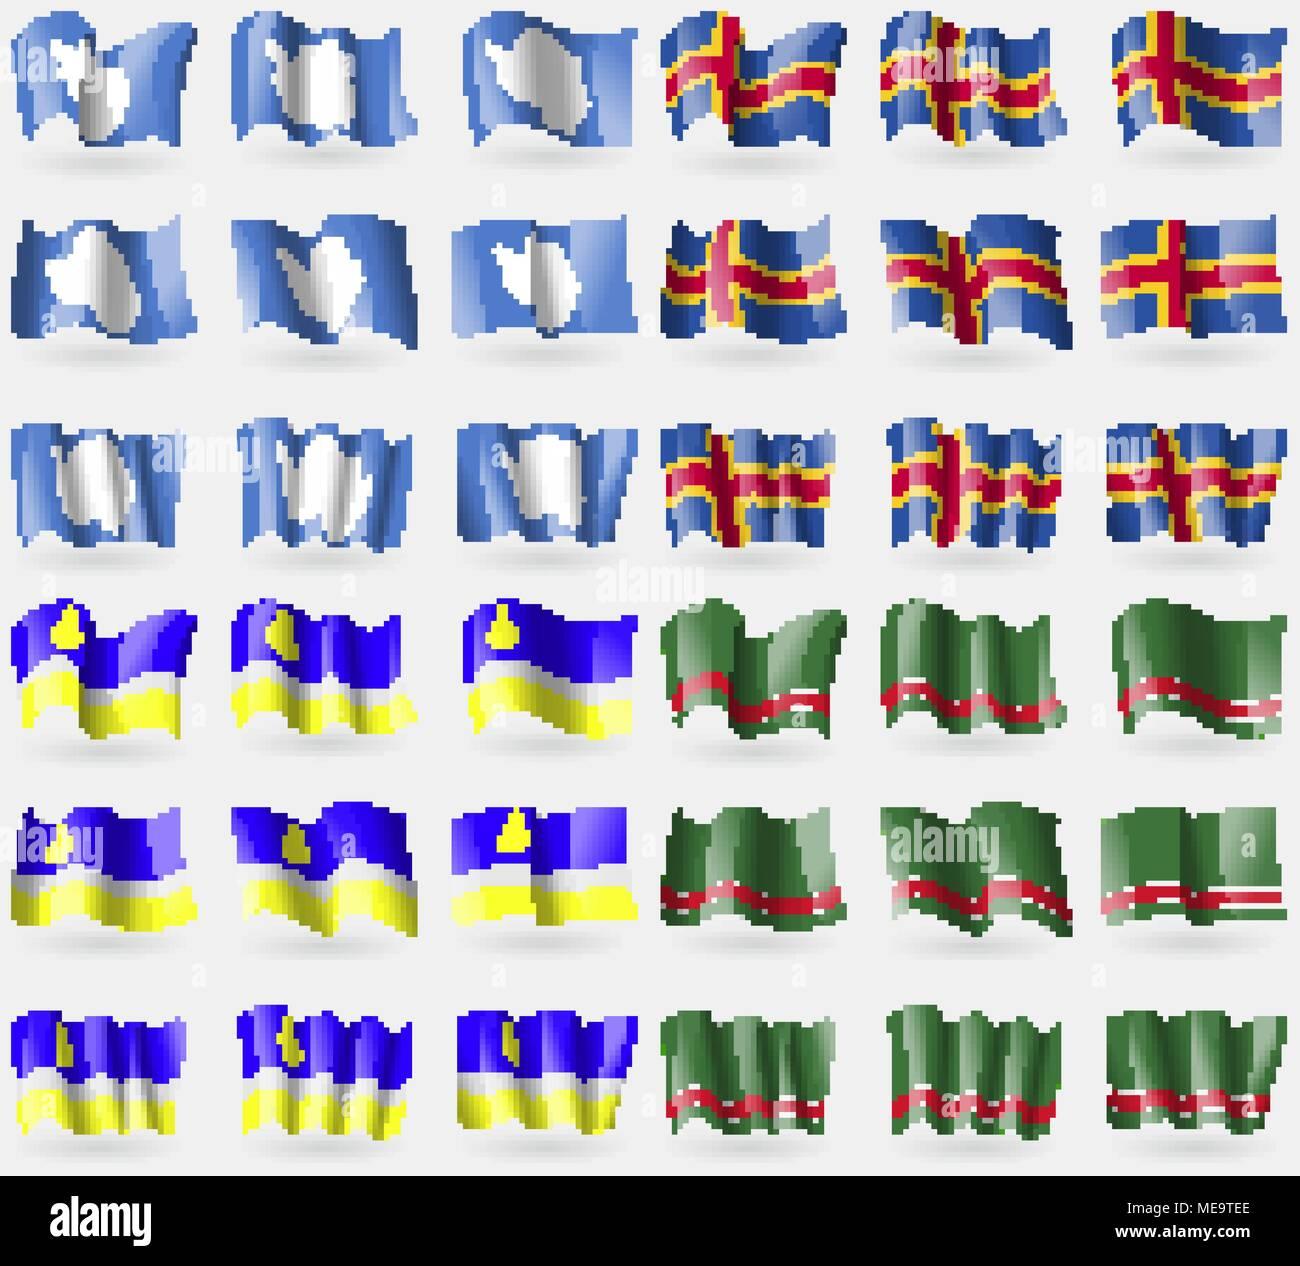 Antarctica, Aland, Buryatia, Chechen Republic of Ichkeria. Set of 36 flags of the countries of the world. Vector illustration - Stock Image